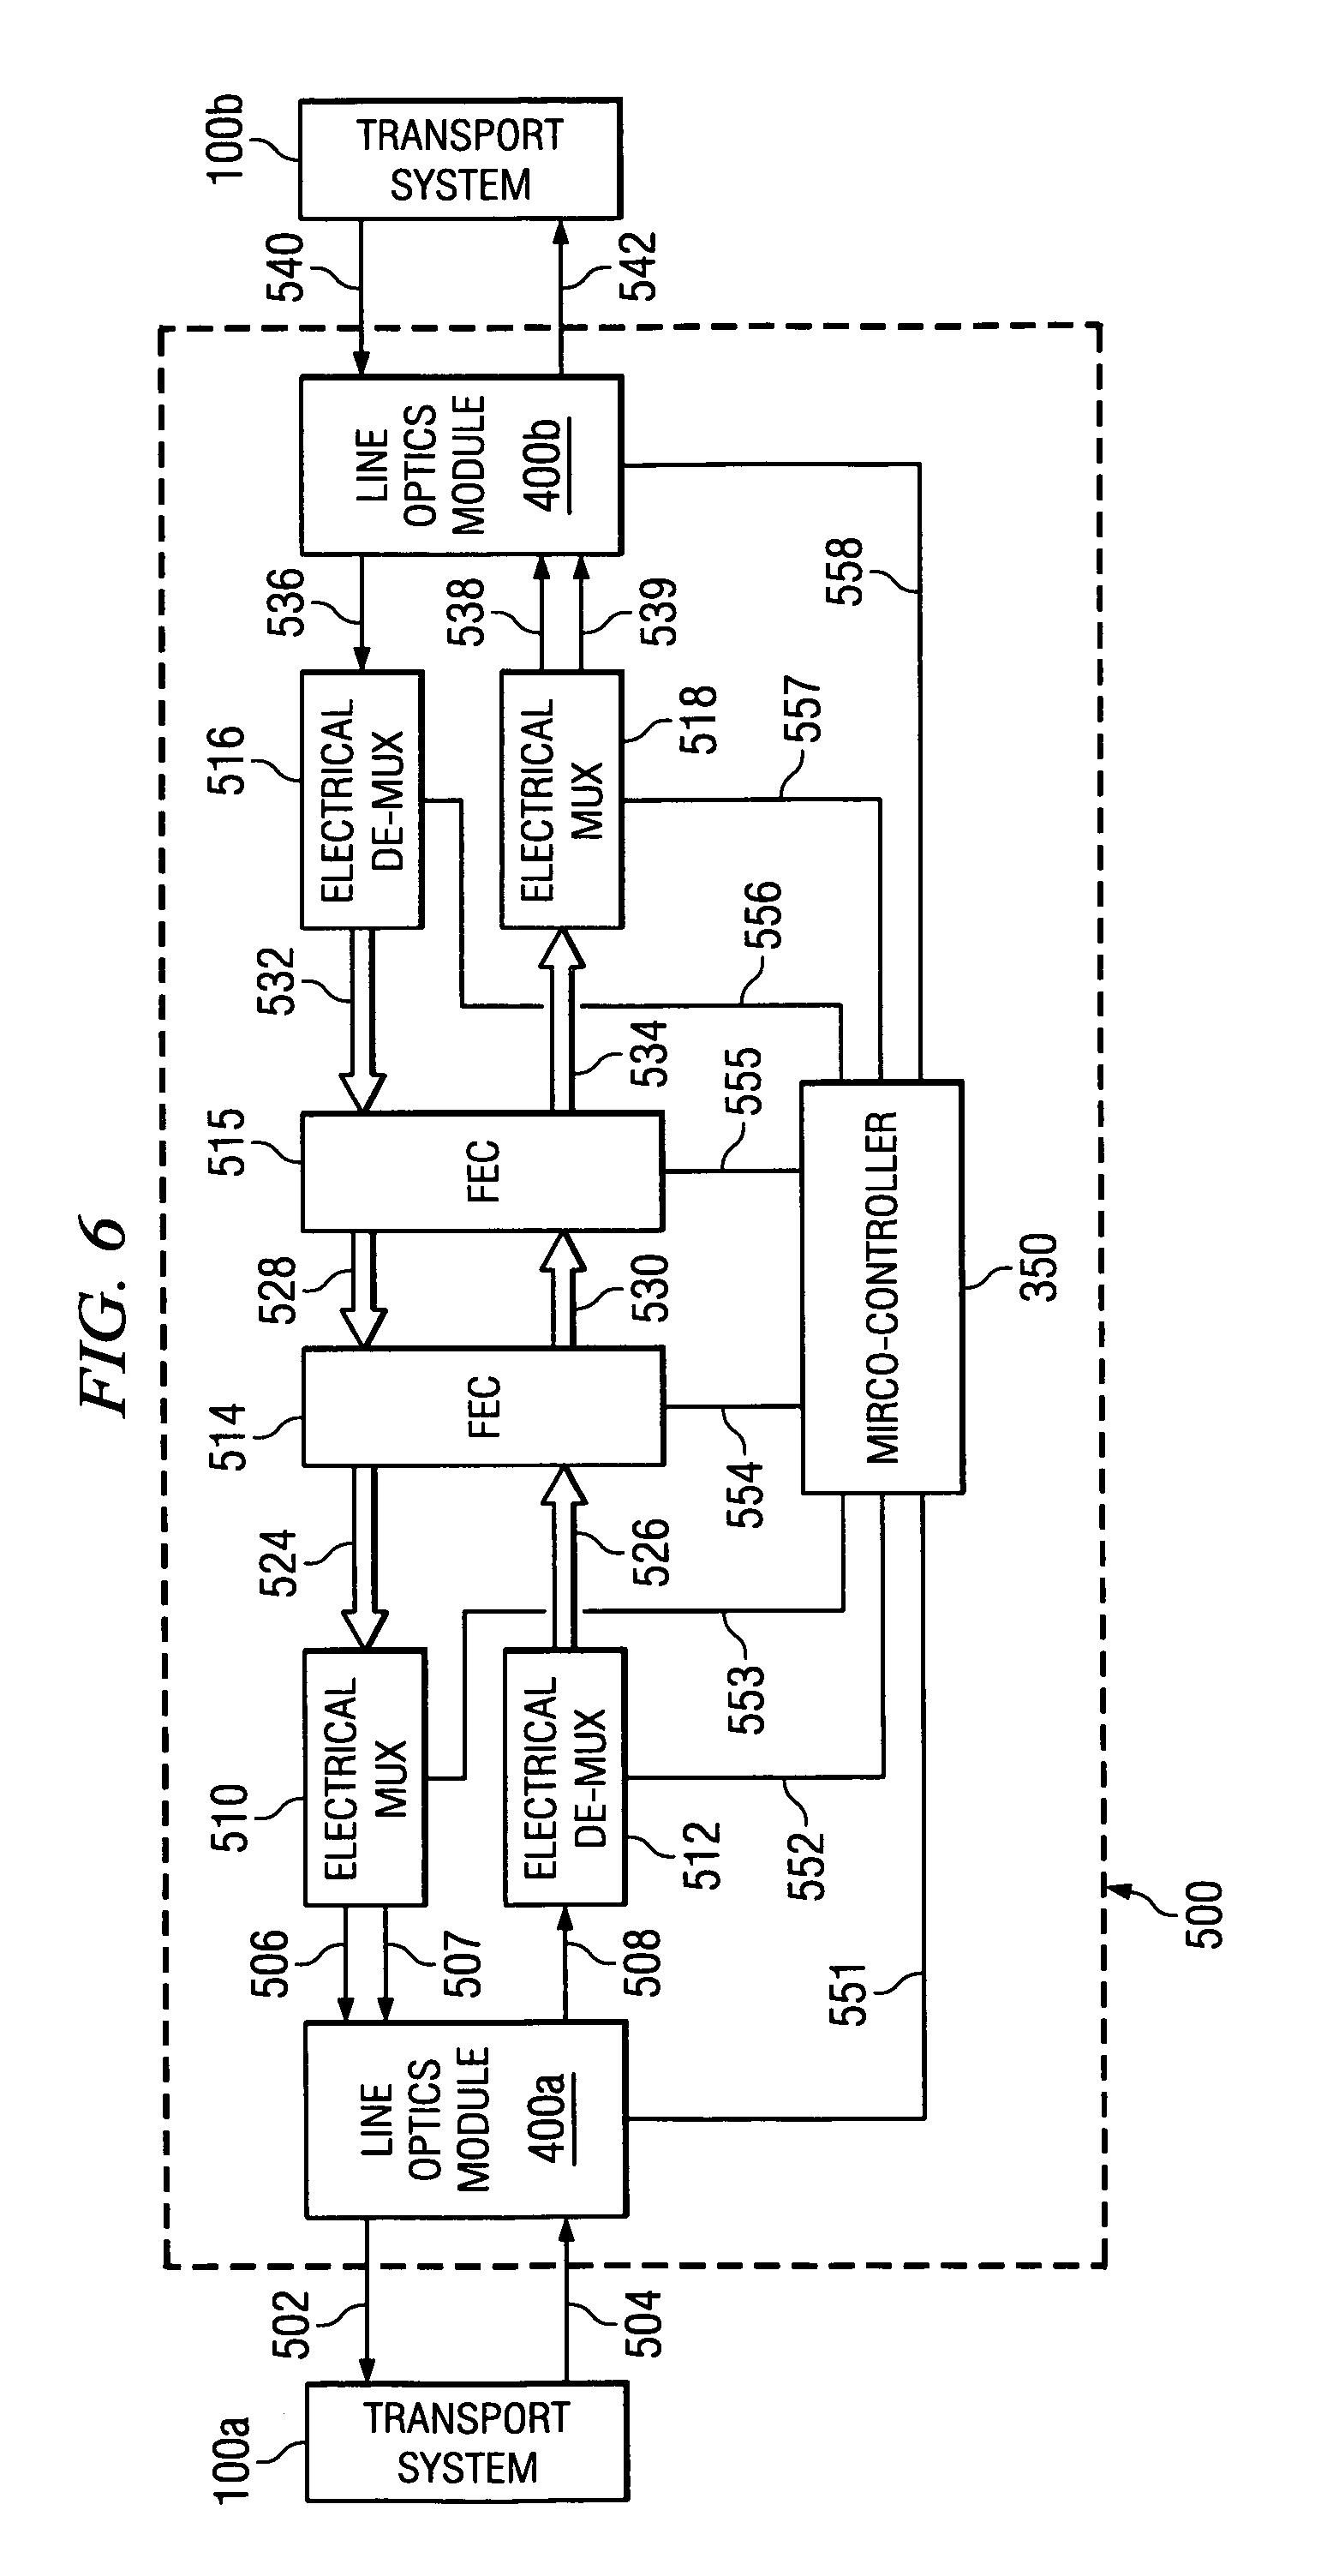 Transpo F540 Wiring Diagram : 27 Wiring Diagram Images